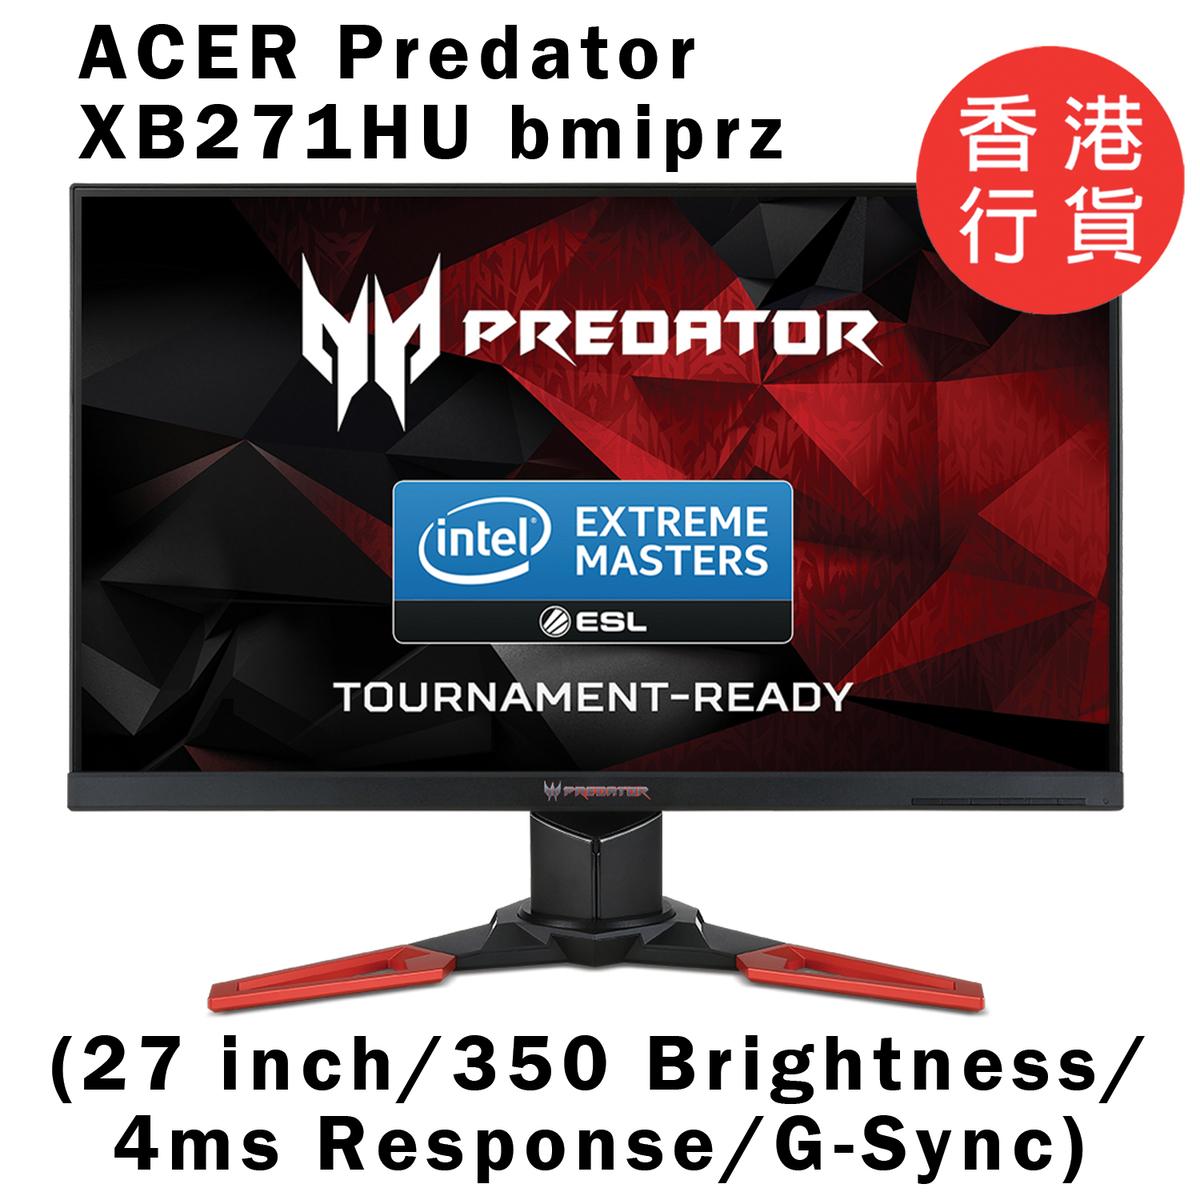 (27 inch/350 Brightness/4ms Response/G-Sync) Predator XB271HU bmiprz